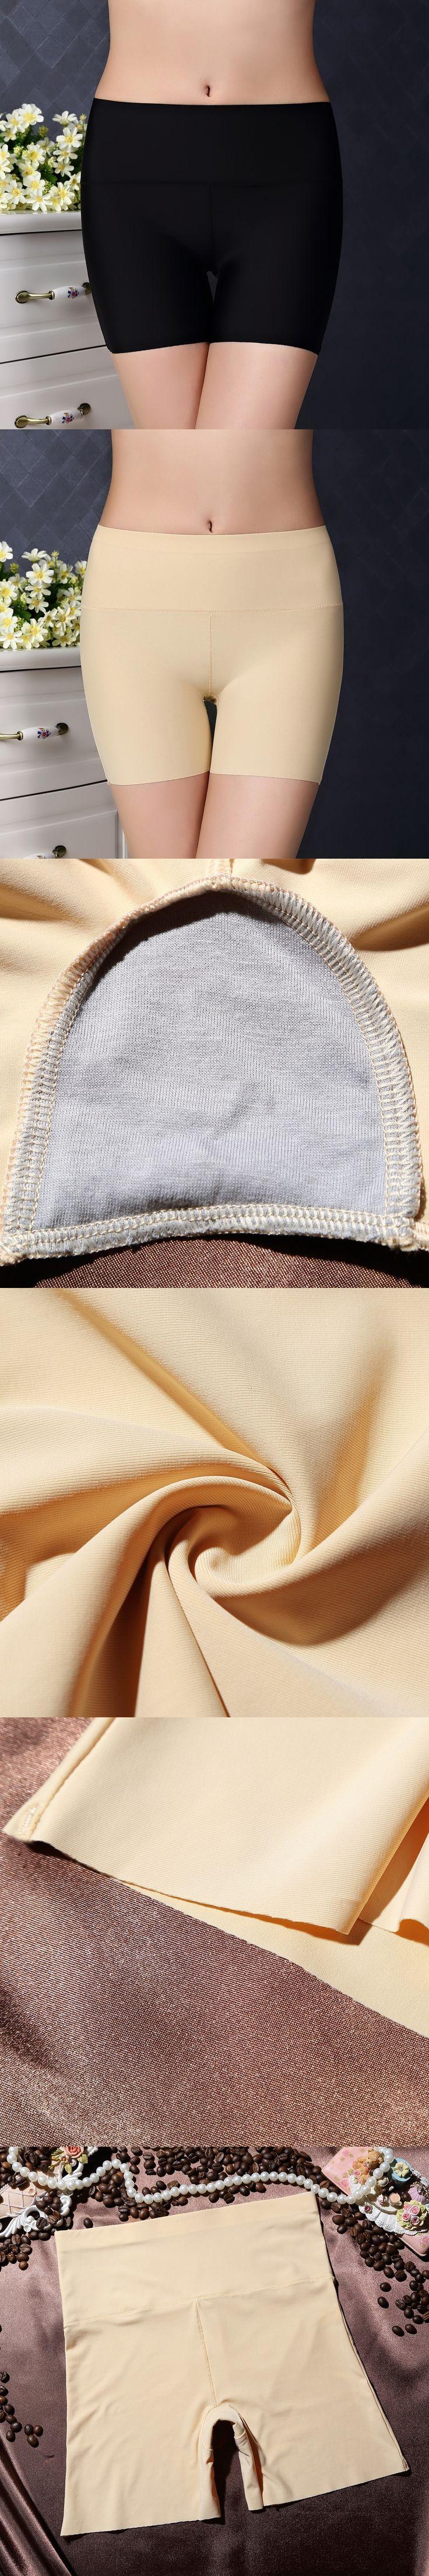 Boyshort Ice Silk Panties Safety pants Women Seamless Women briefs Fashion classic comfortable Underwear For Women Underpants